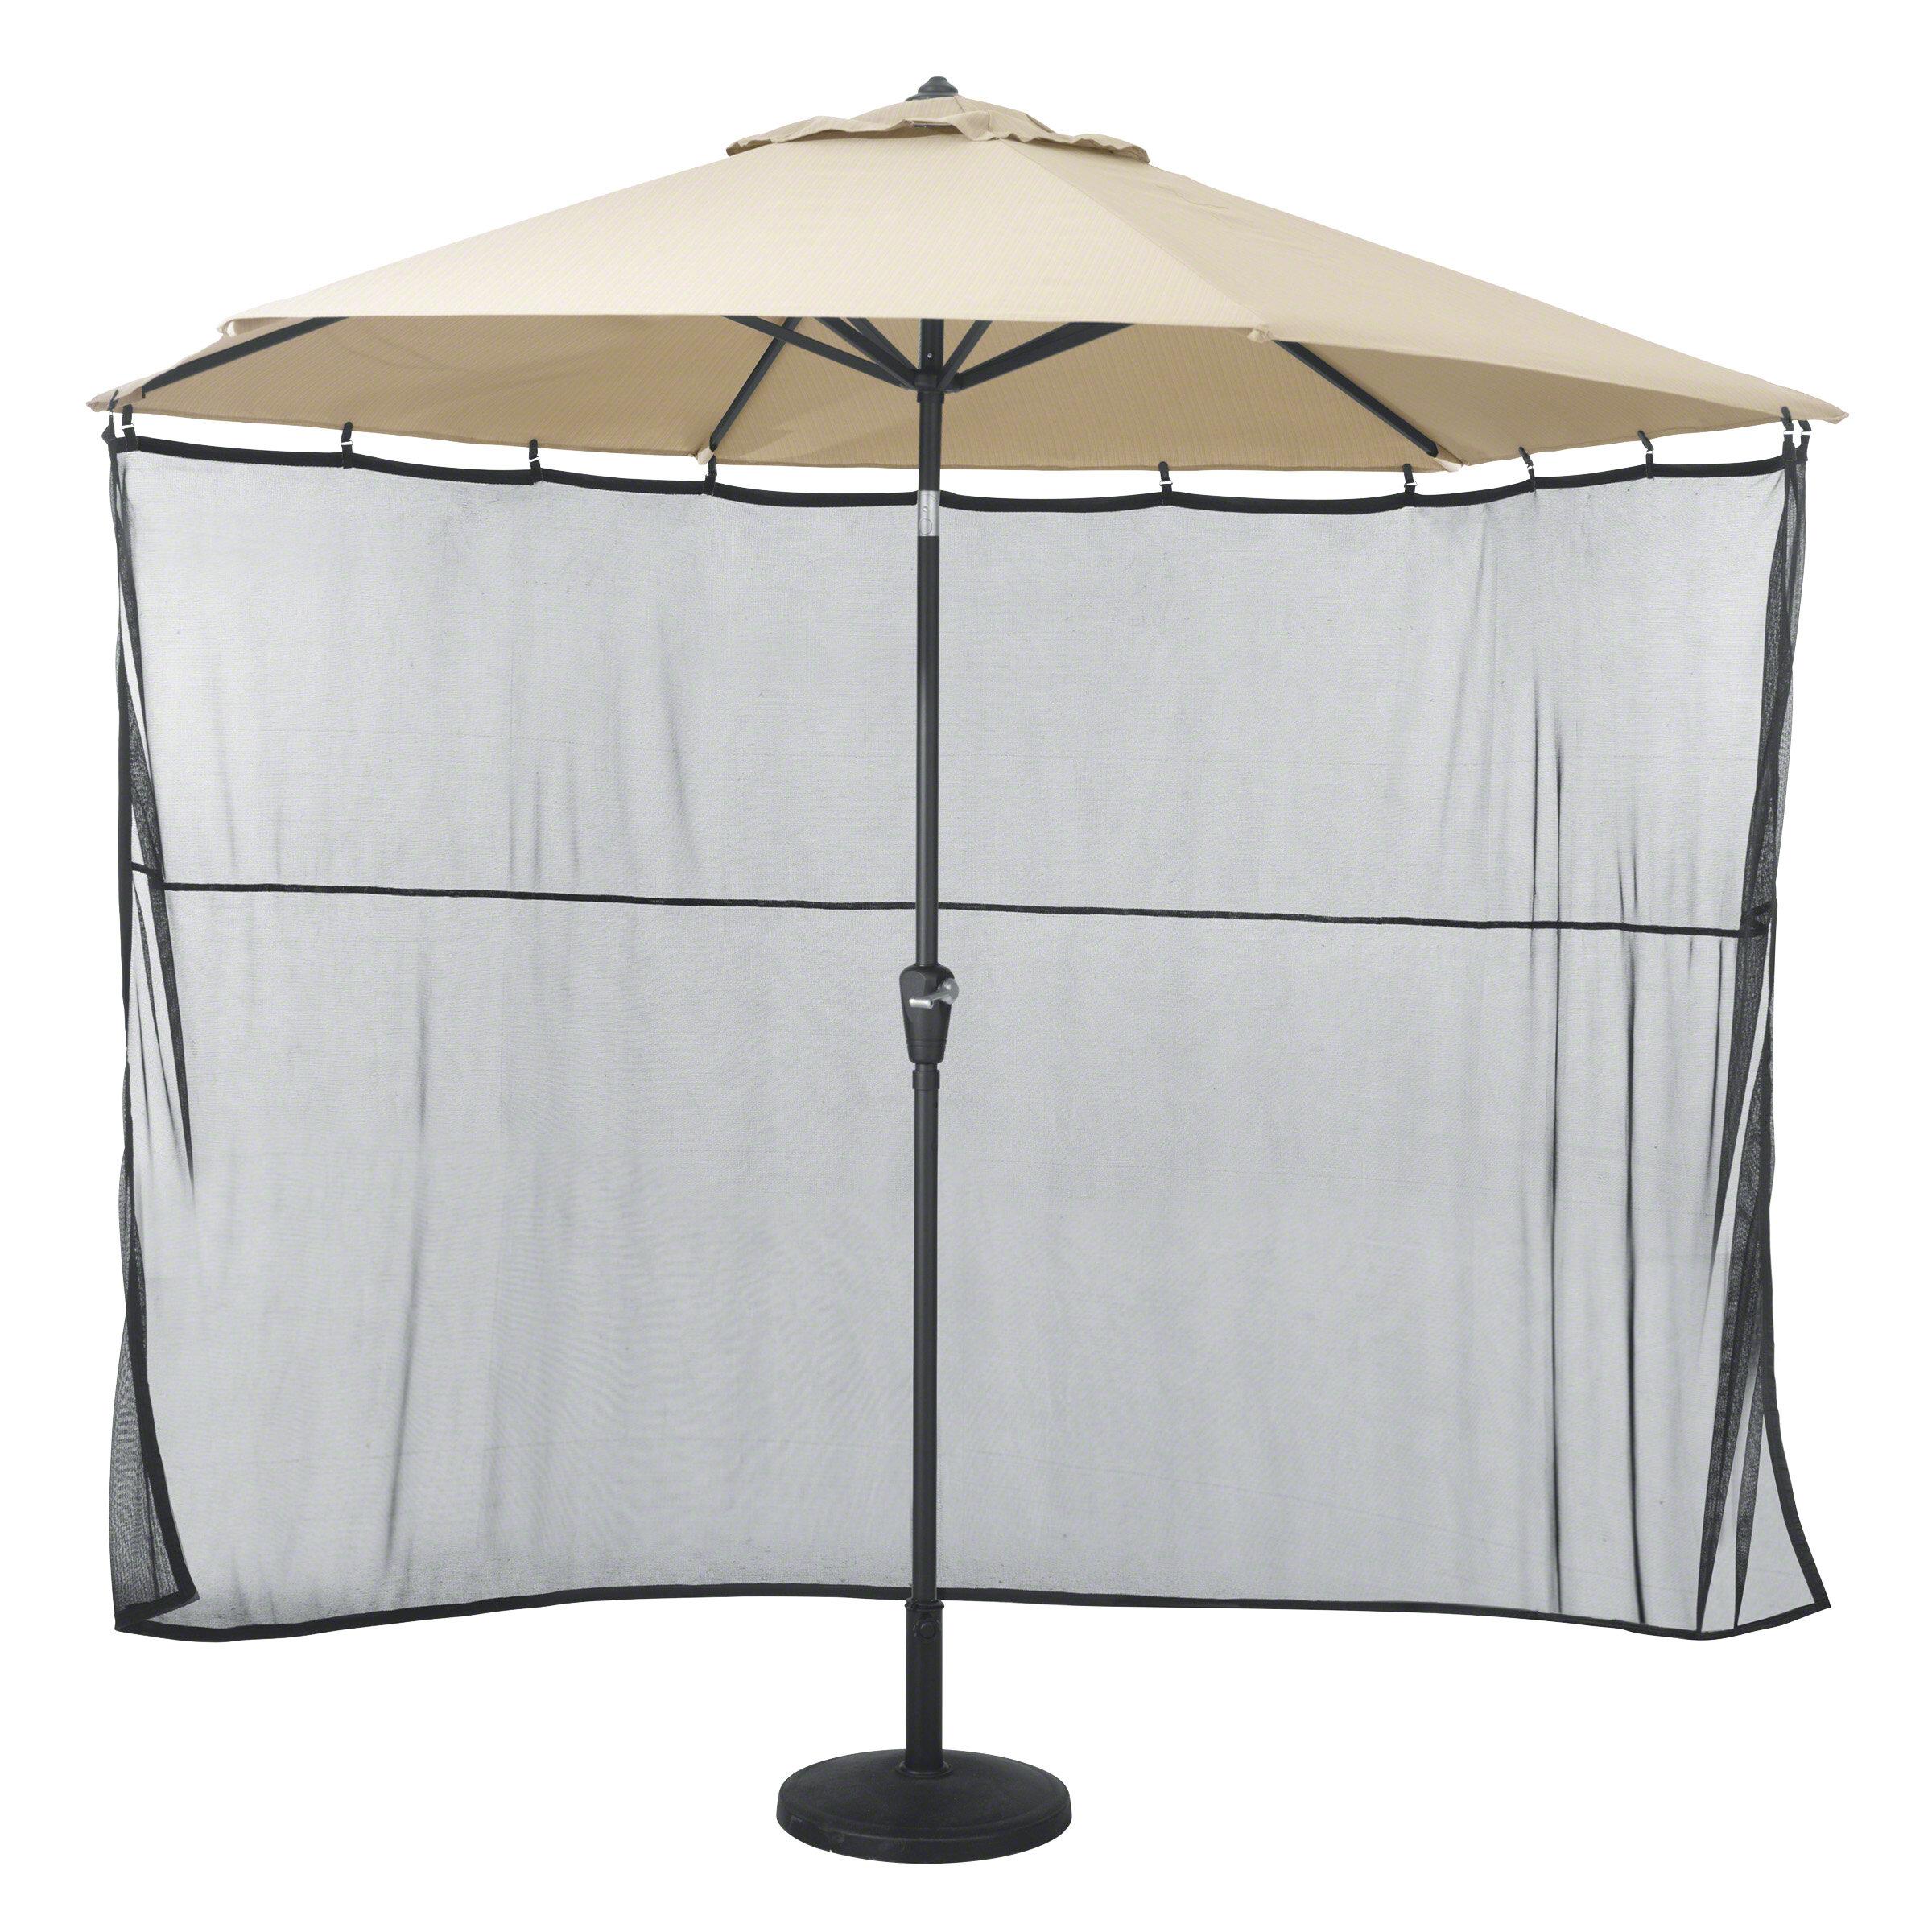 Clic Accessories Patio Umbrella Side Wall Sun Shade Netting Reviews Wayfair